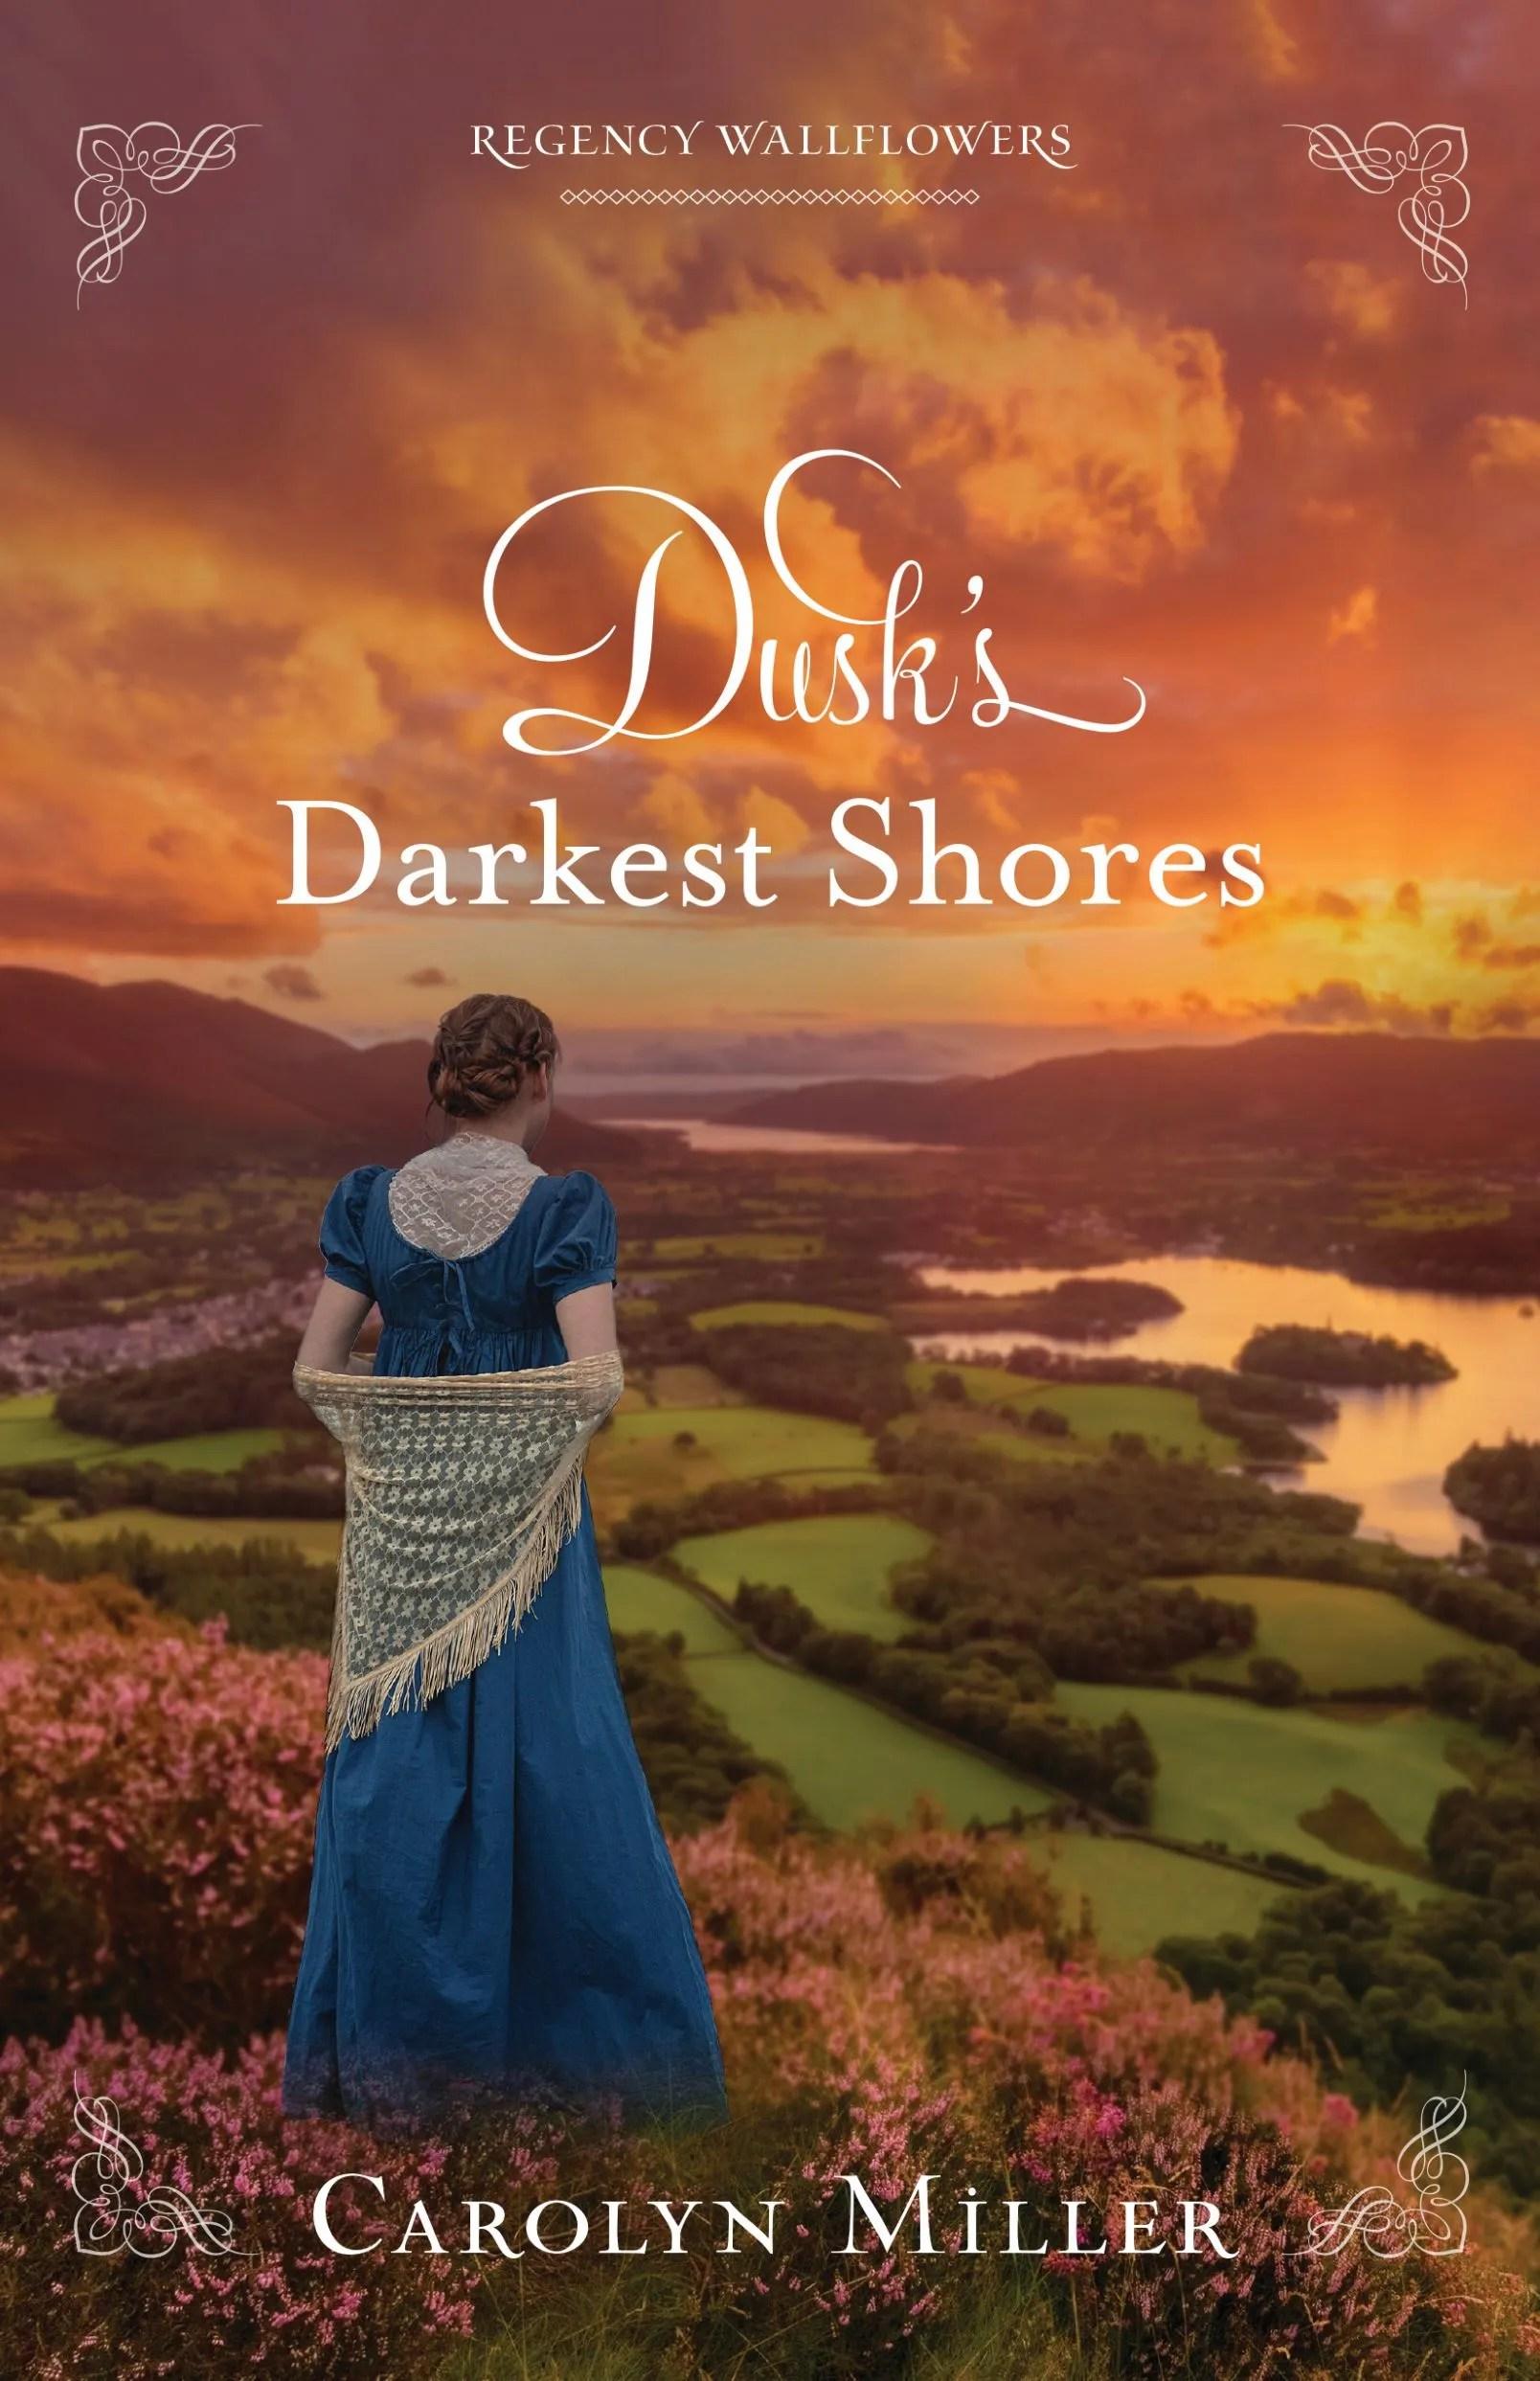 Dusk's Darkest